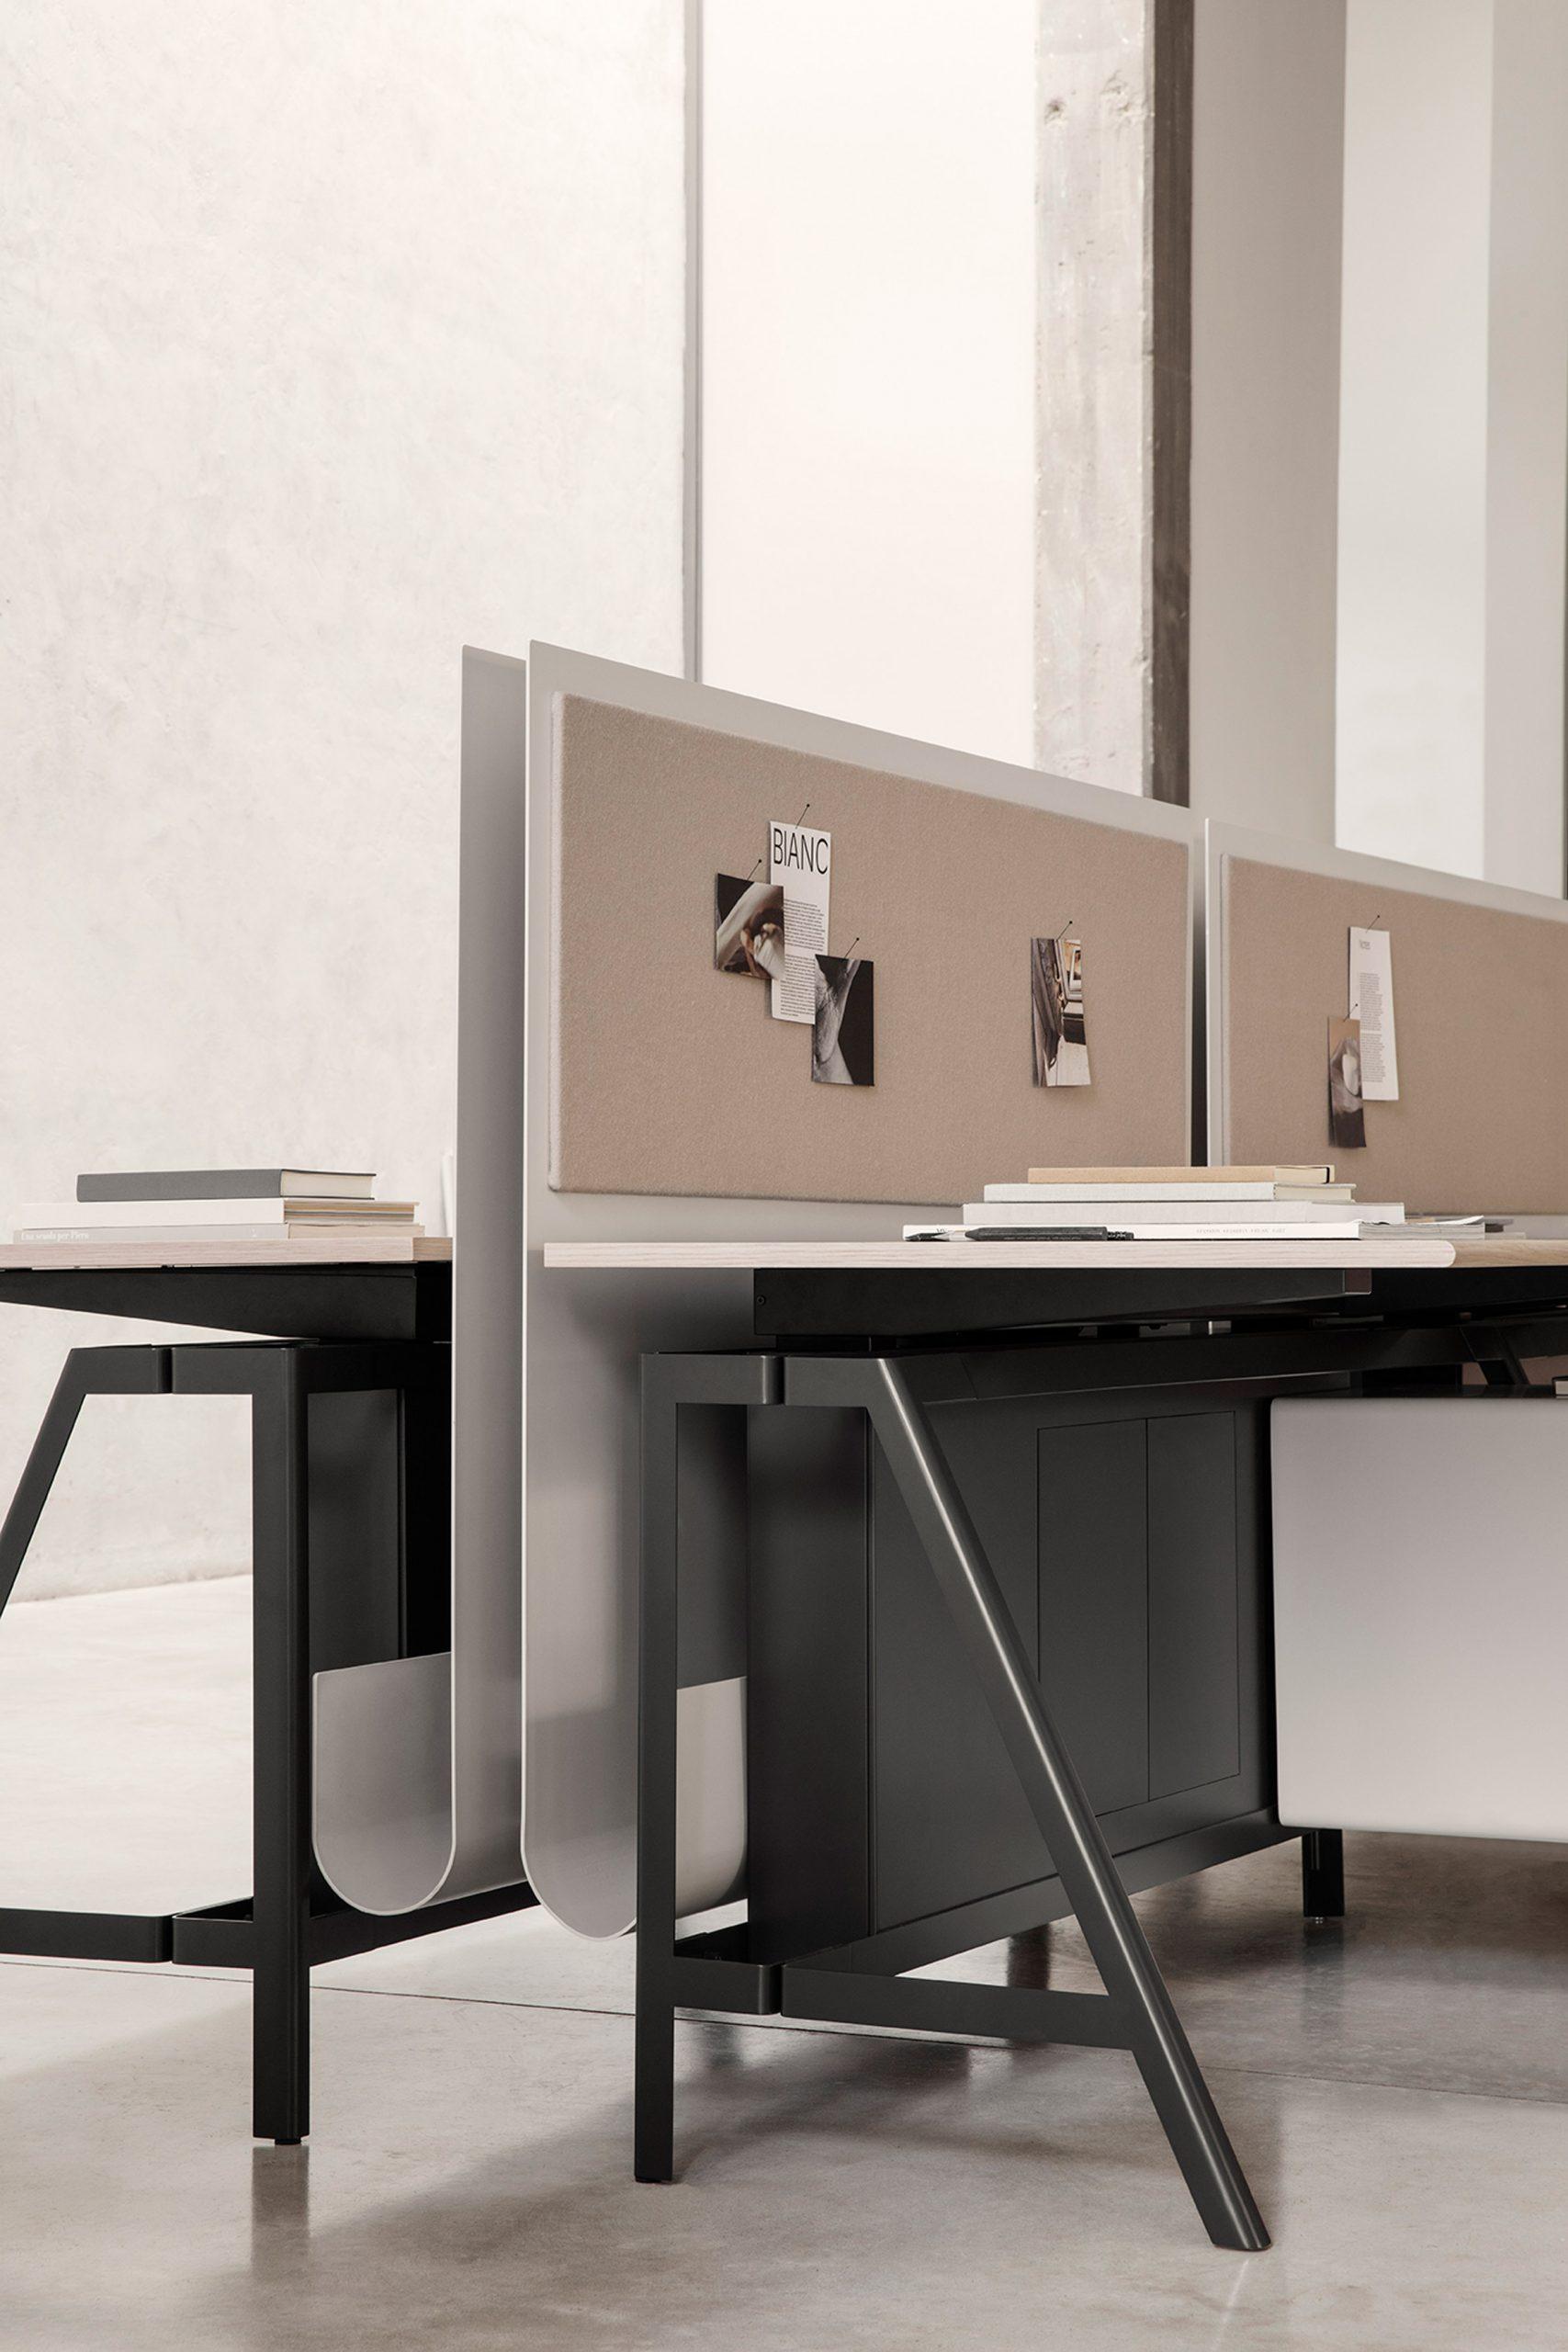 IOC designs Solari workstation in collaboration with Gensler